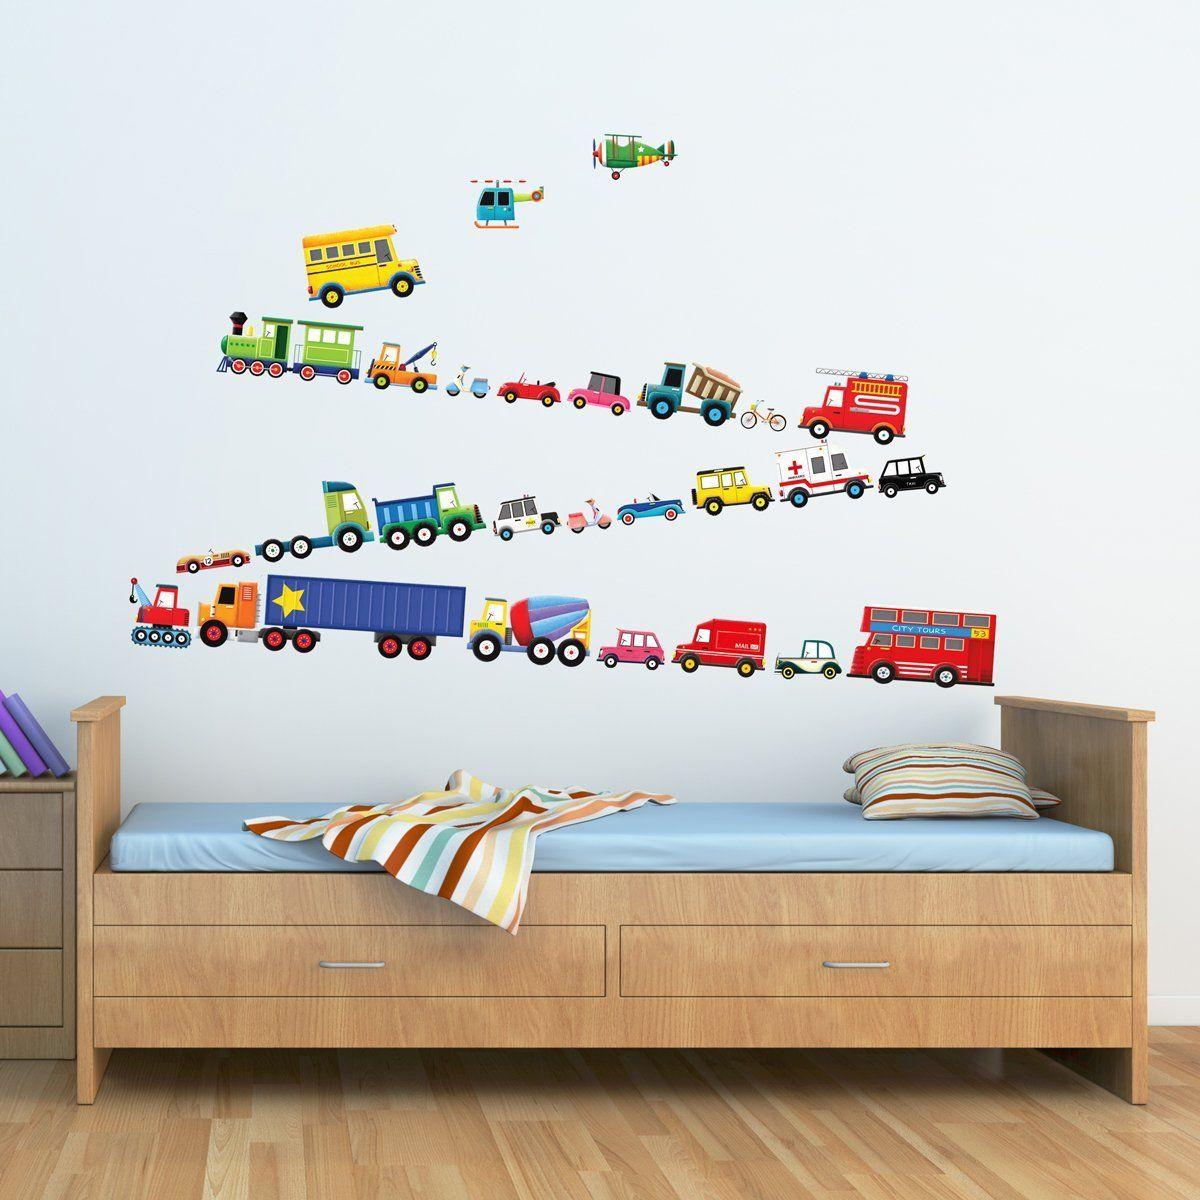 Amazon Com Decowall Dw 1605 27 Transports Kids Wall Decals Wall Stickers Peel And Stick Removab Kids Bedroom Wall Decor Kids Wall Decals Nursery Wall Stickers [ 1200 x 1200 Pixel ]